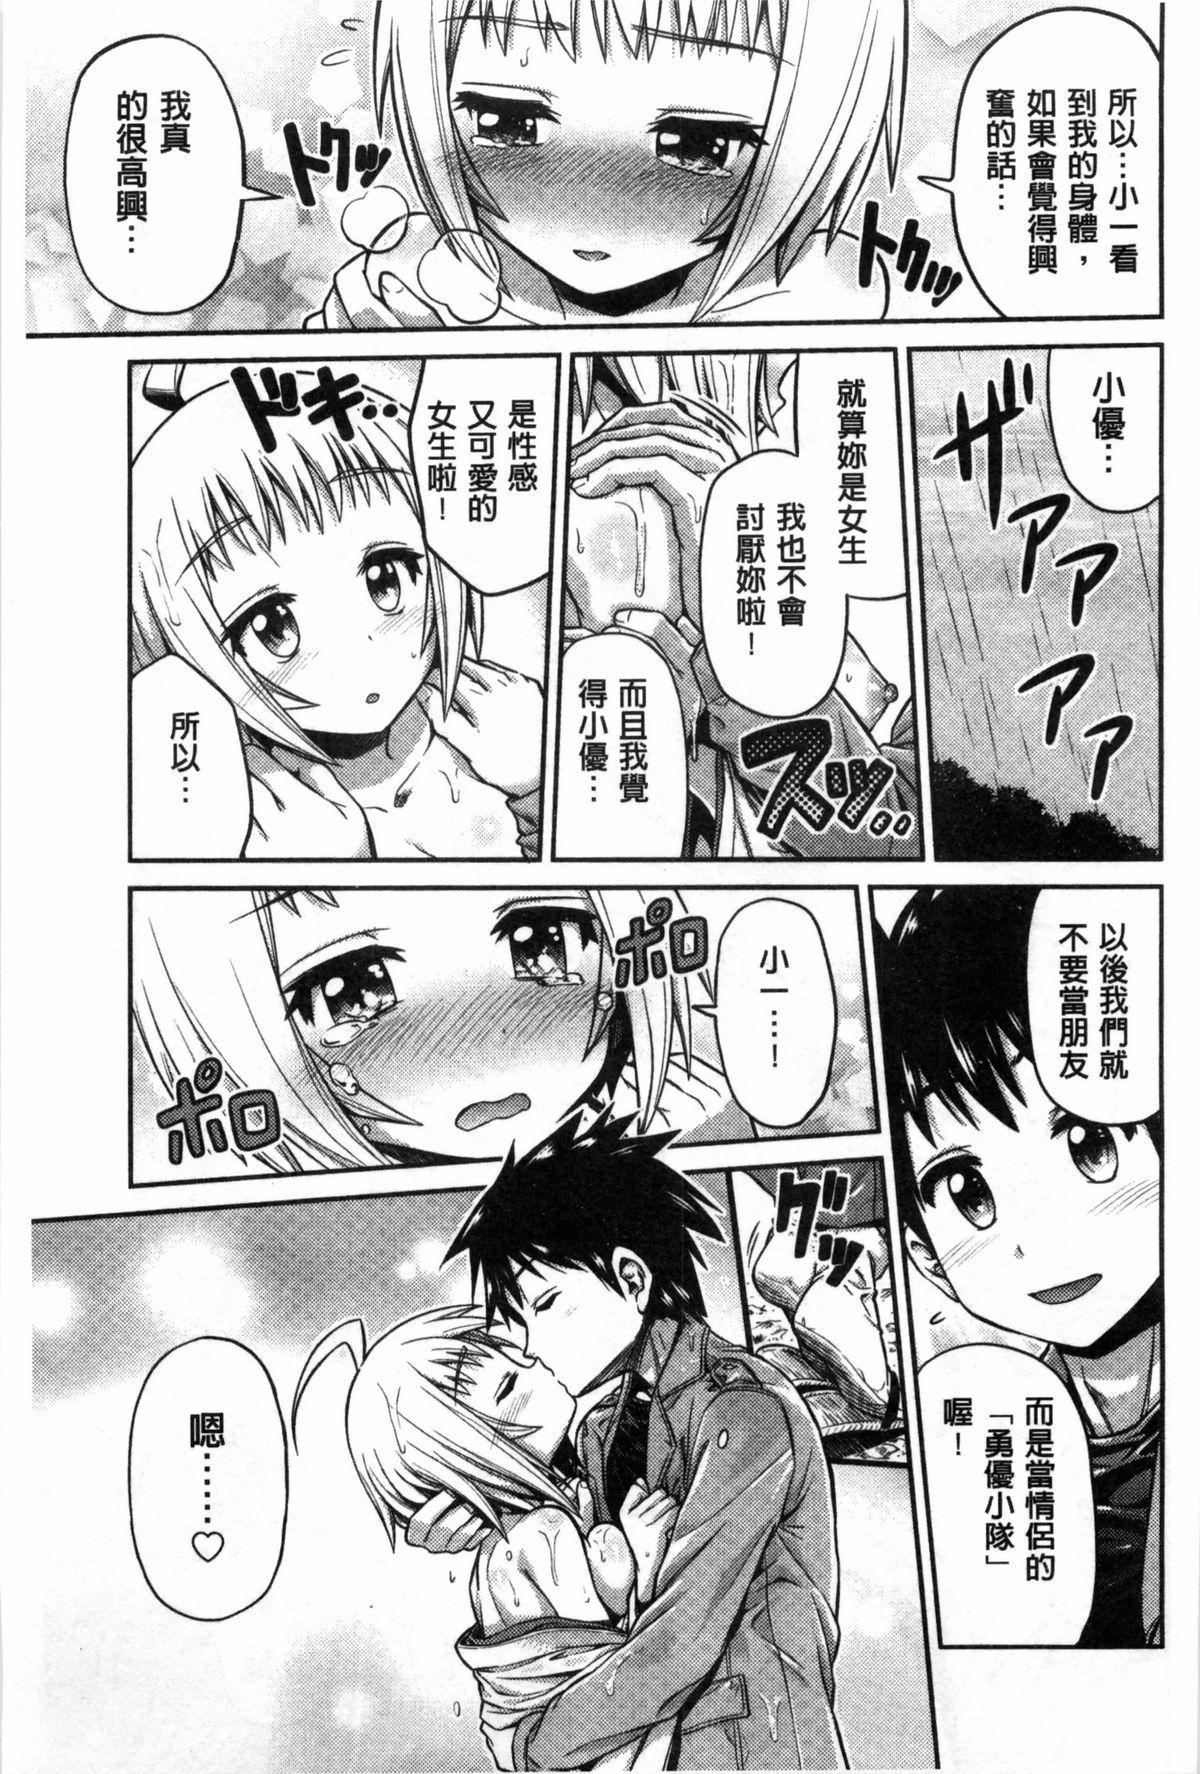 Man x Koi - Ero Manga de Hajimaru Koi no Plot   A漫×戀情 由情色漫畫所萌生的戀之物語 85